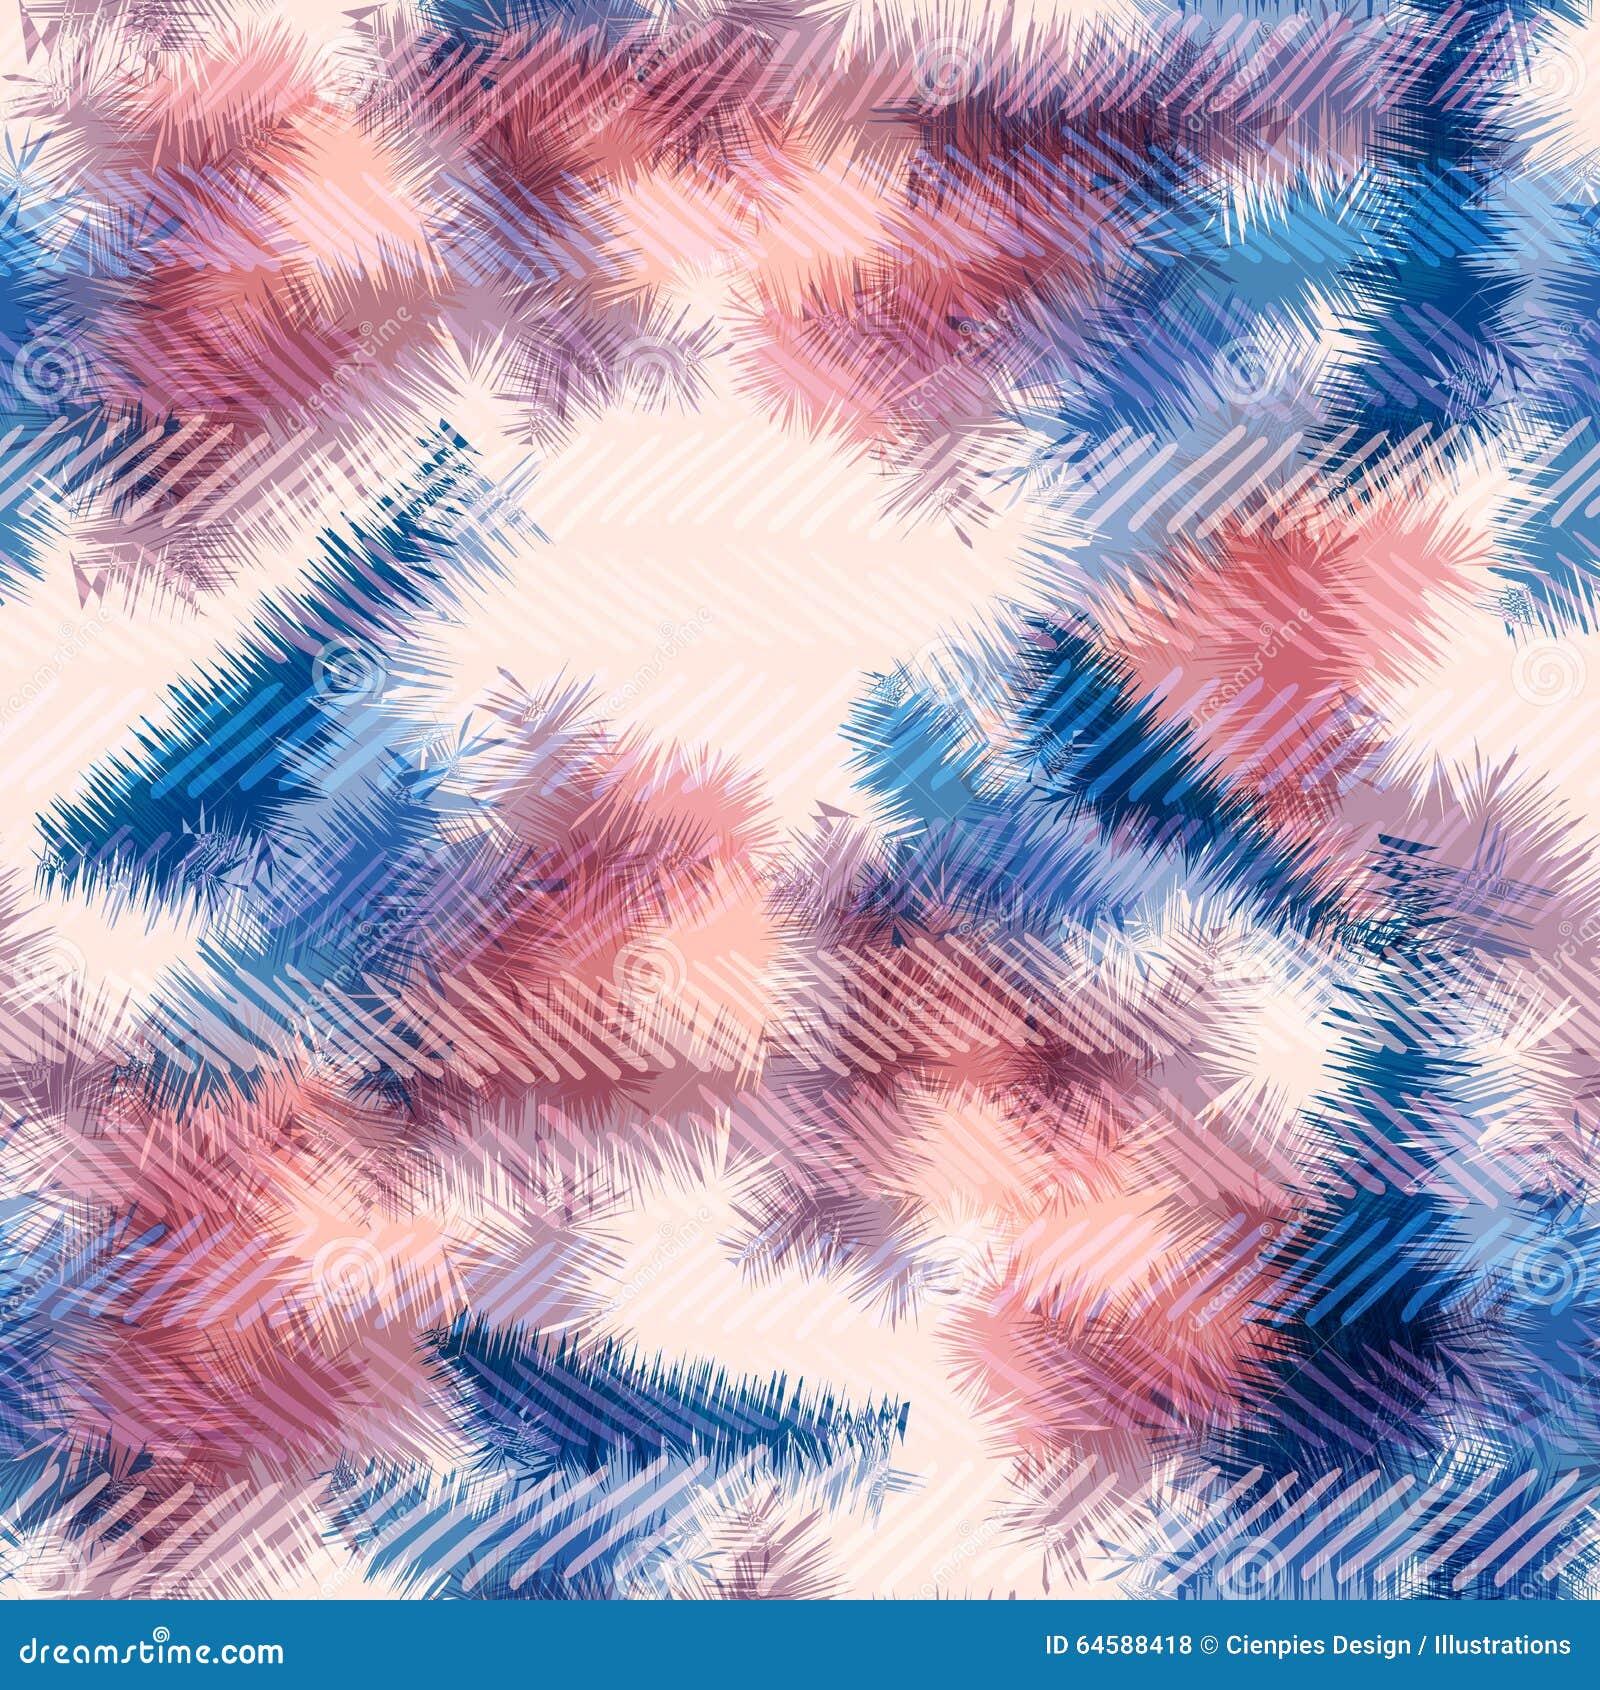 seamless repeating tie dye - photo #7